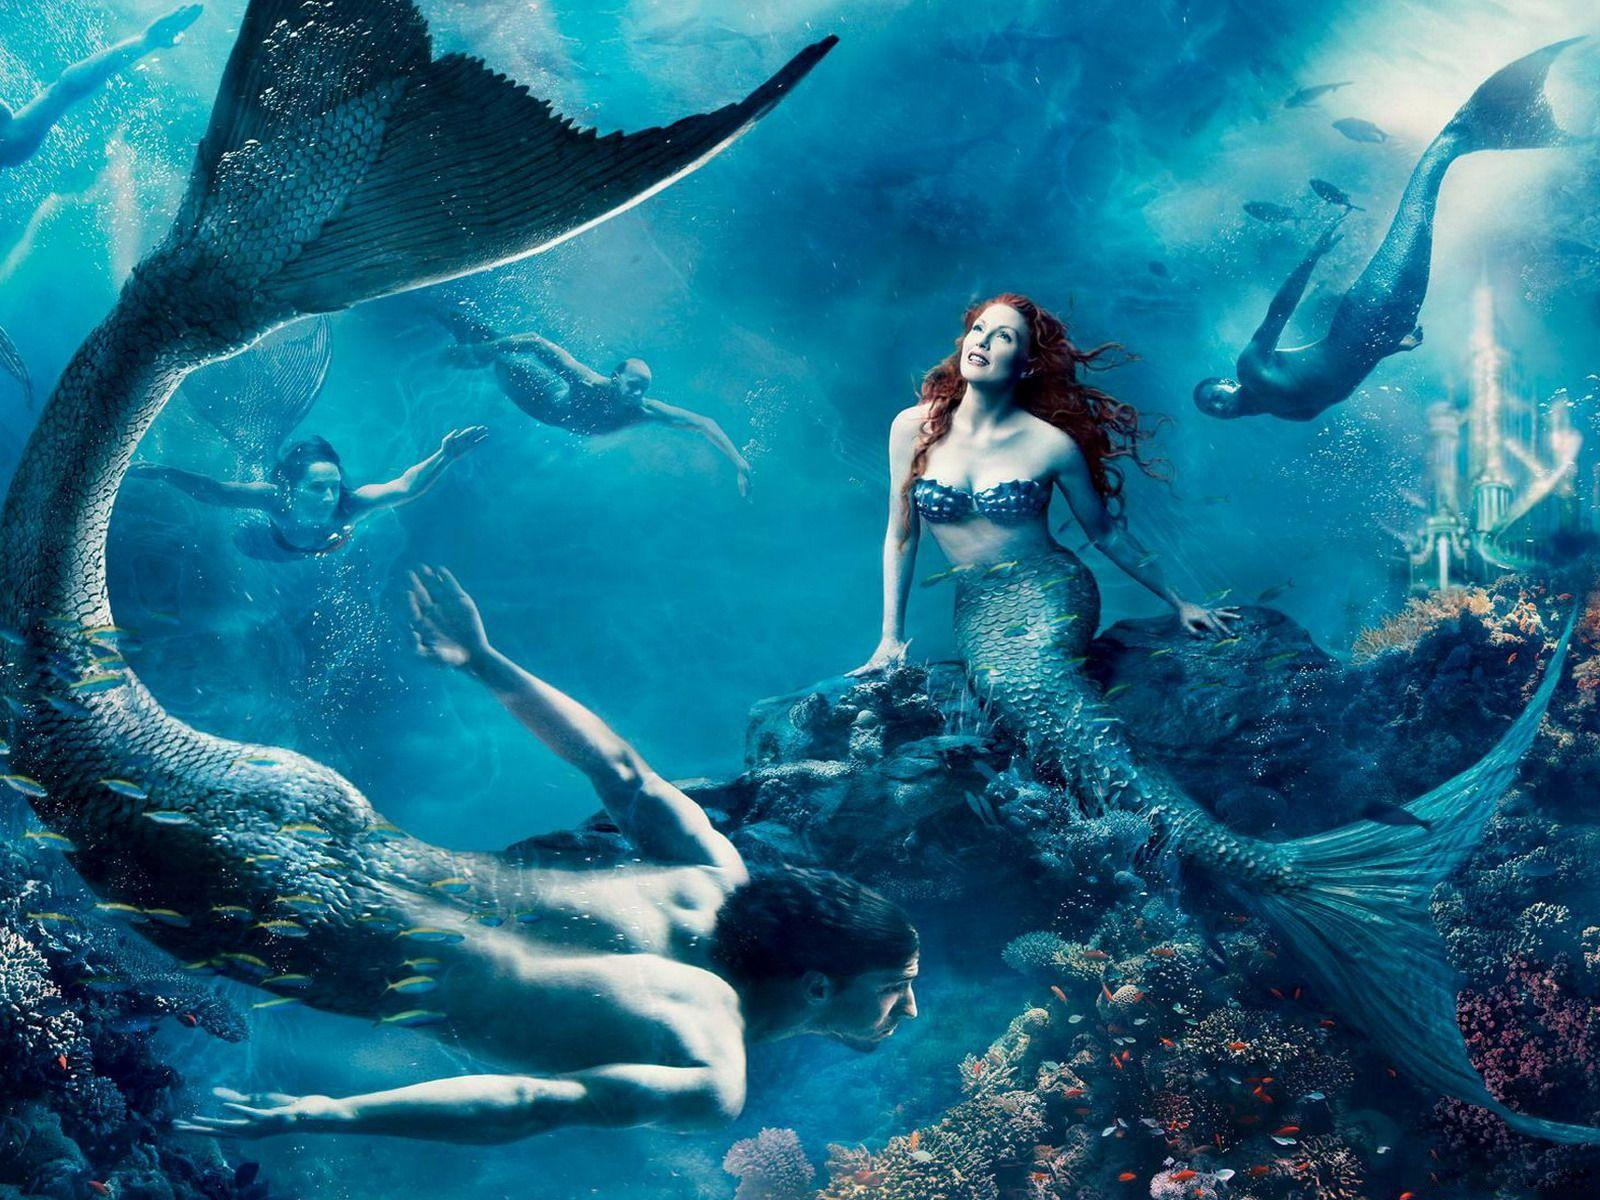 free fantasy screensavers and